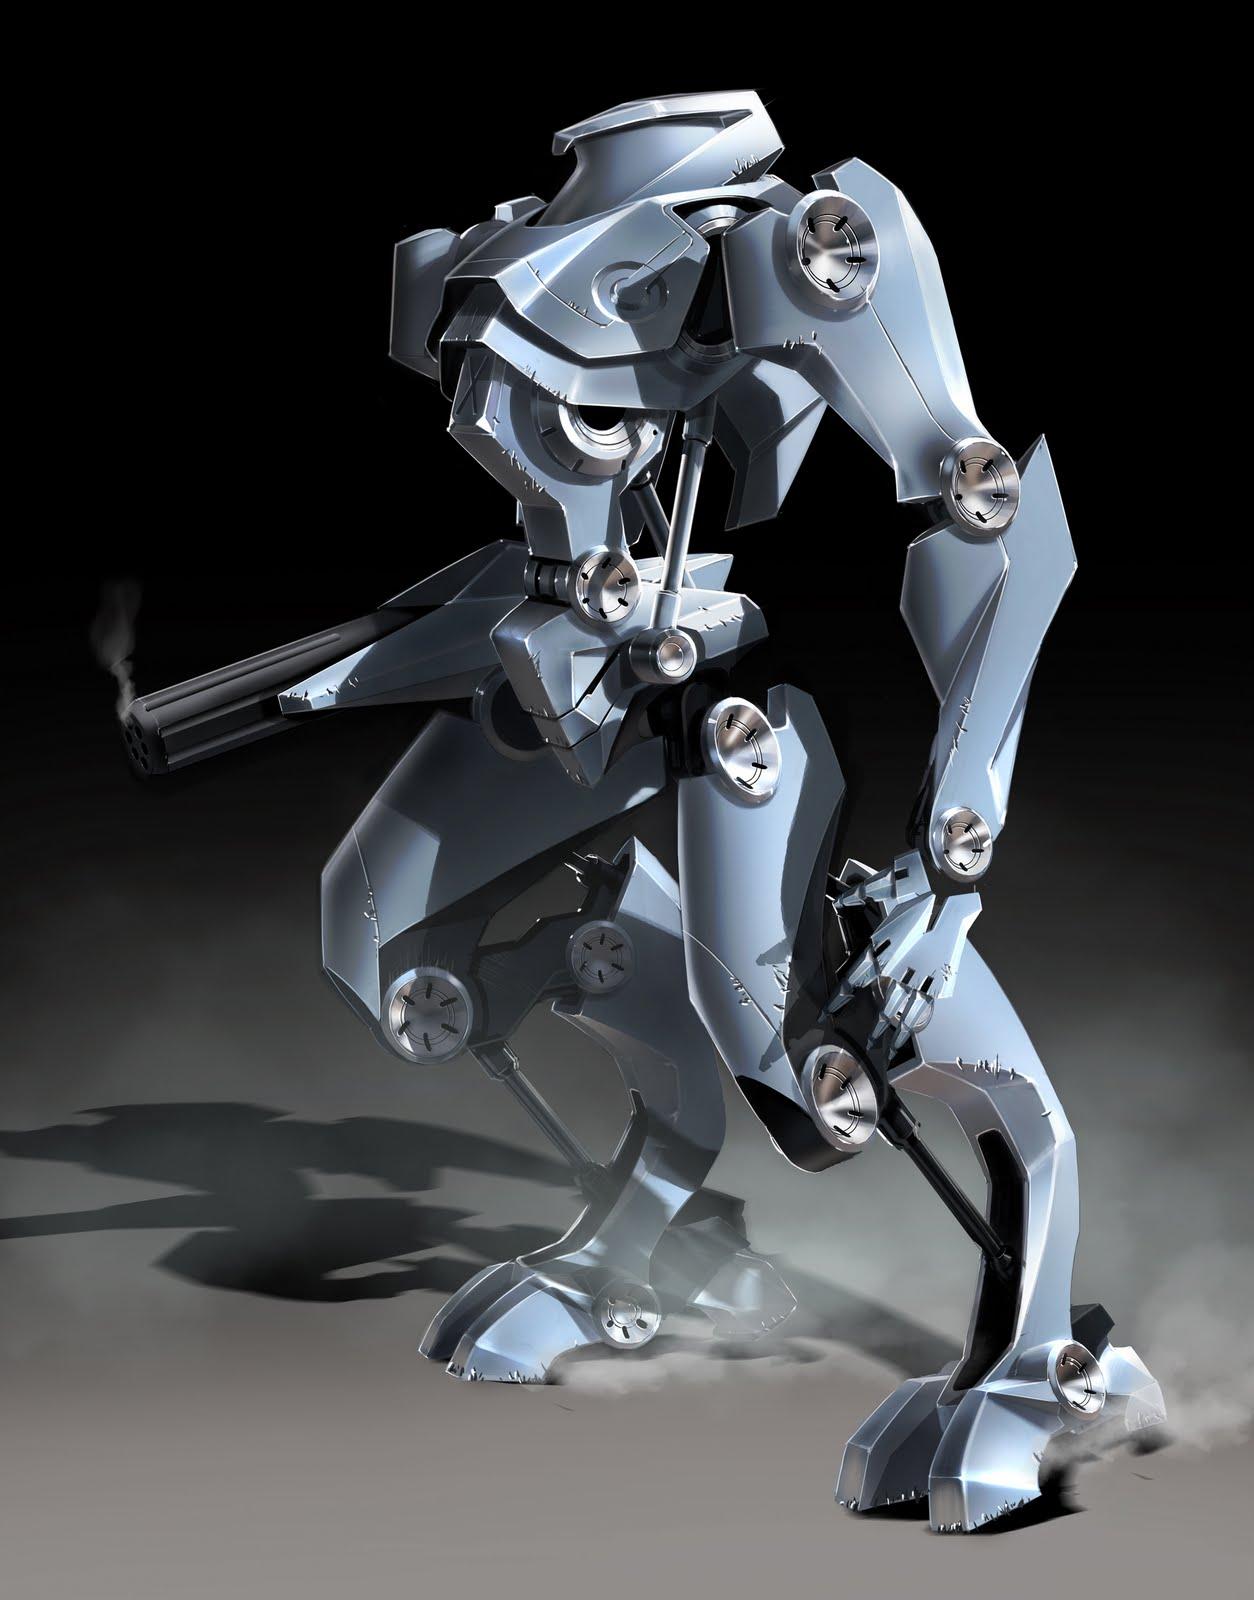 Robotunit8 something is